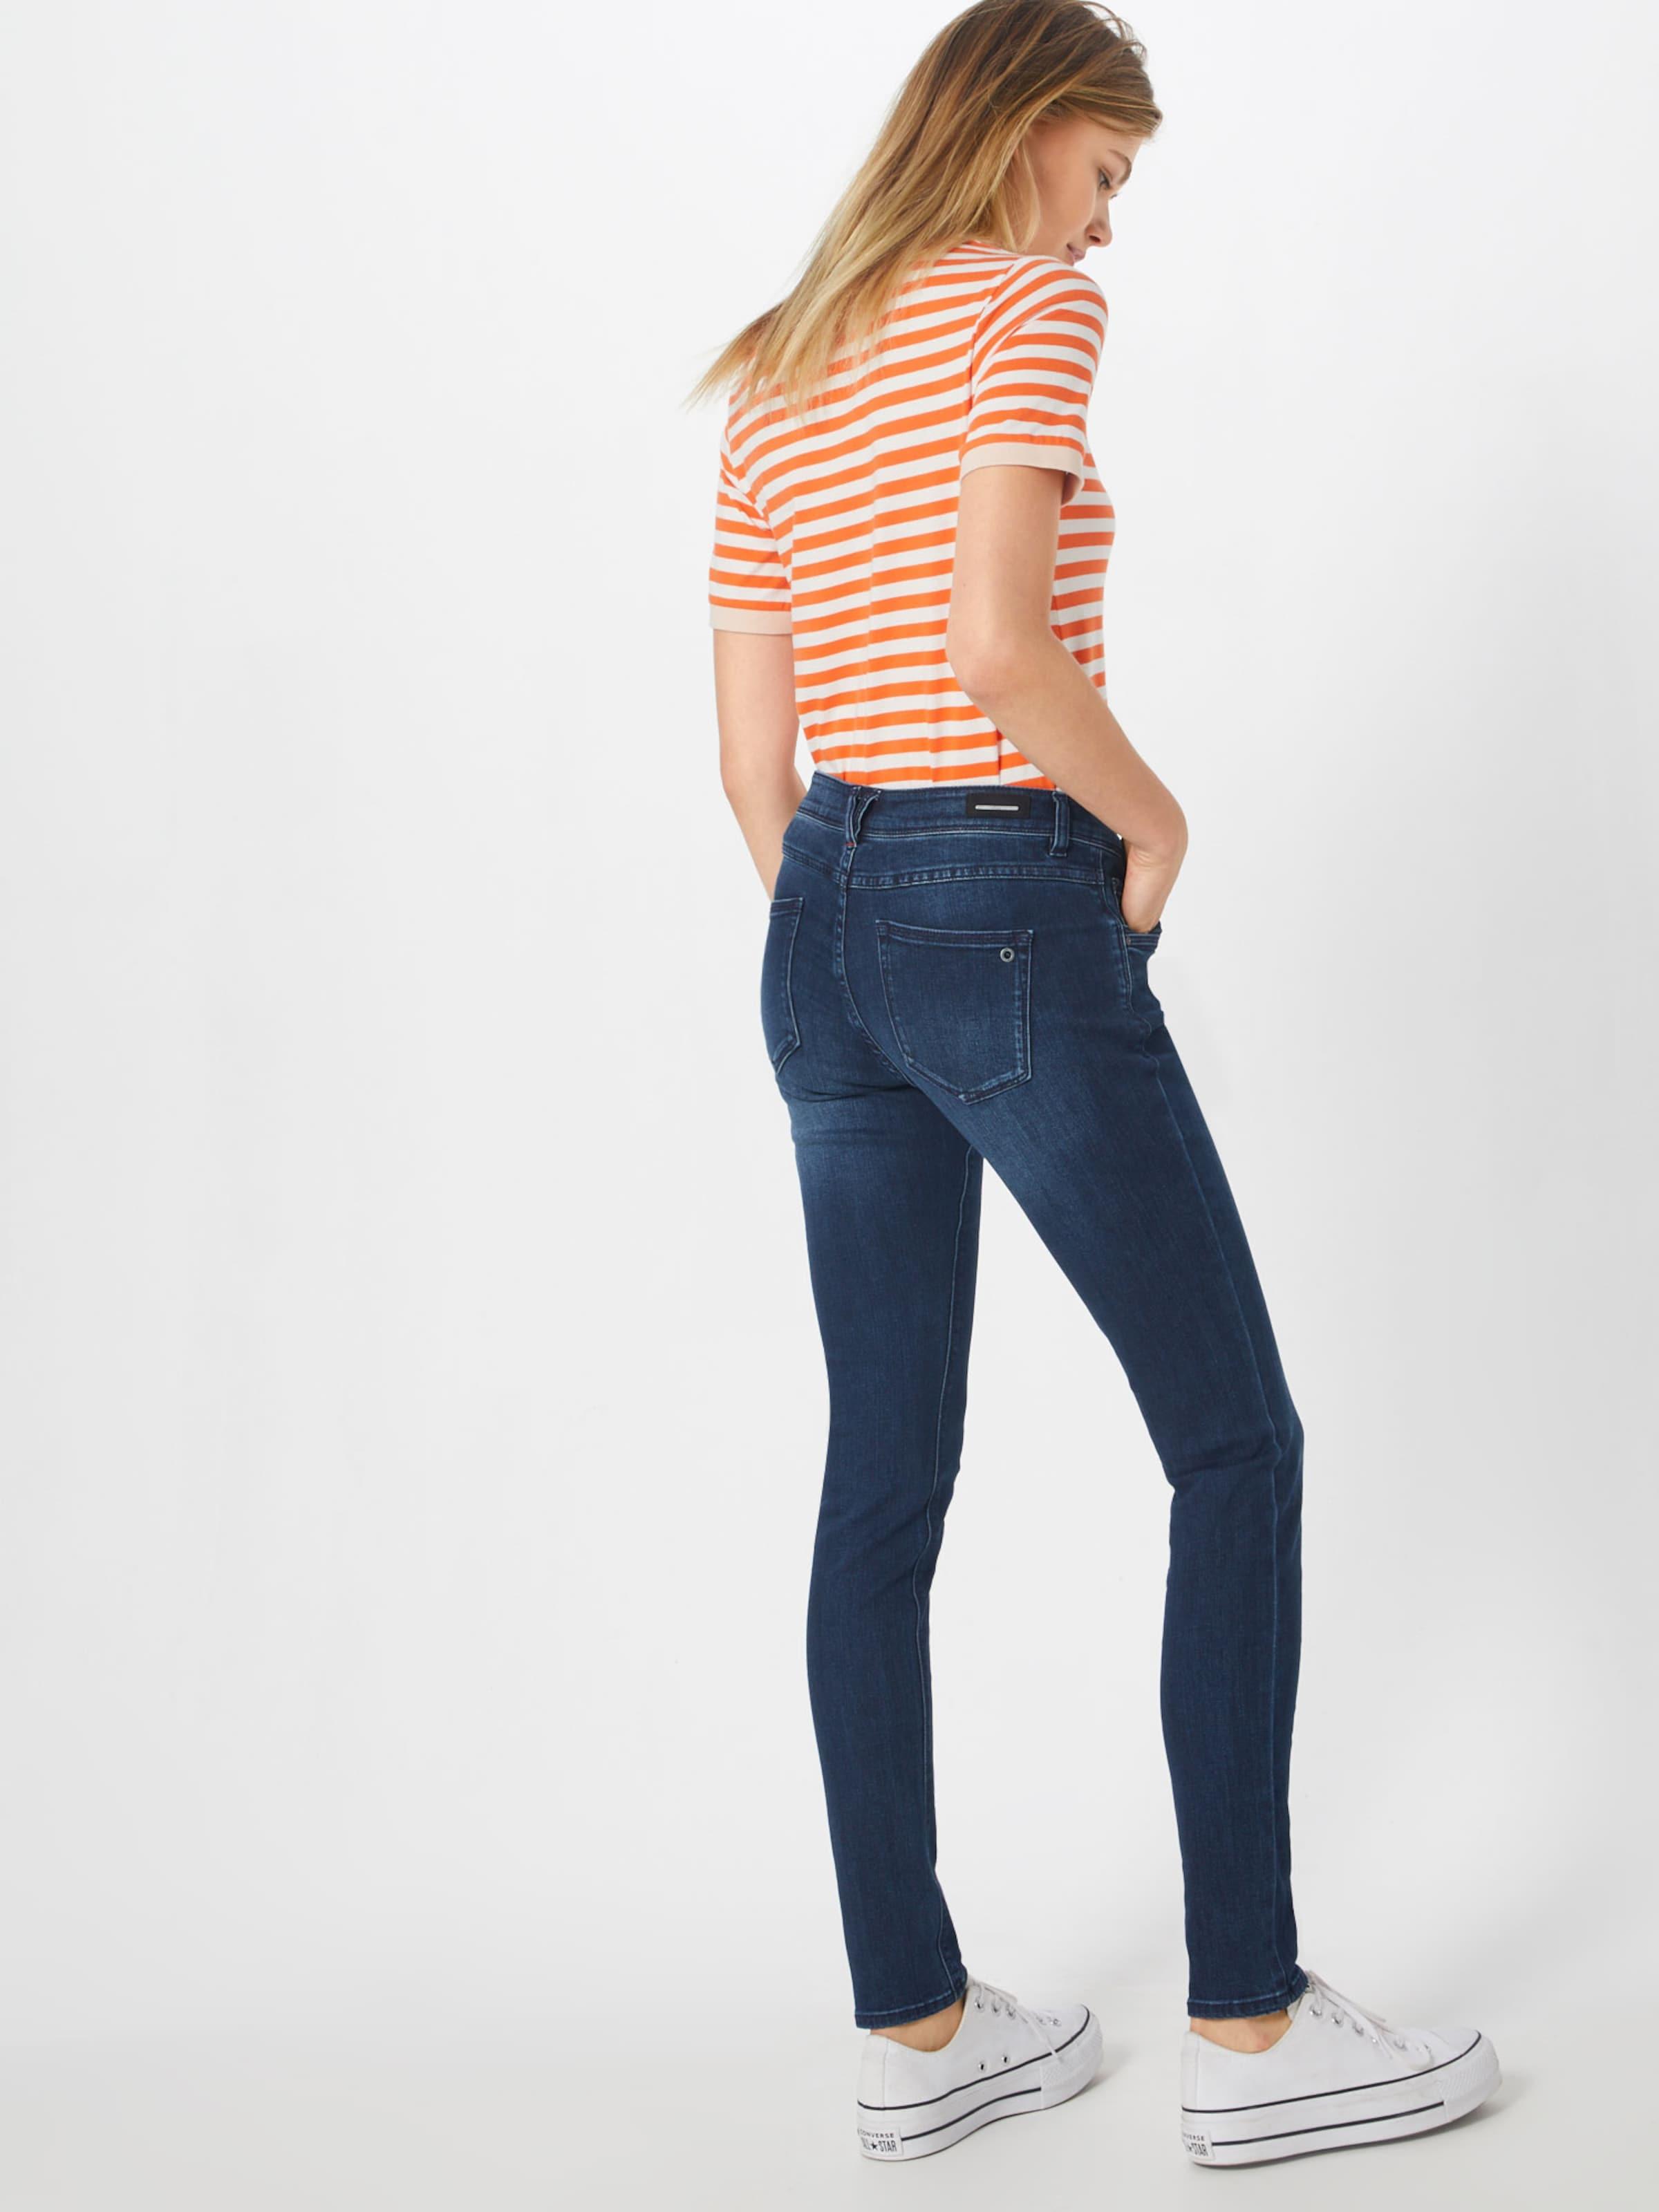 Denim In Jeans Red Label oliver Blue S L3R54qAj